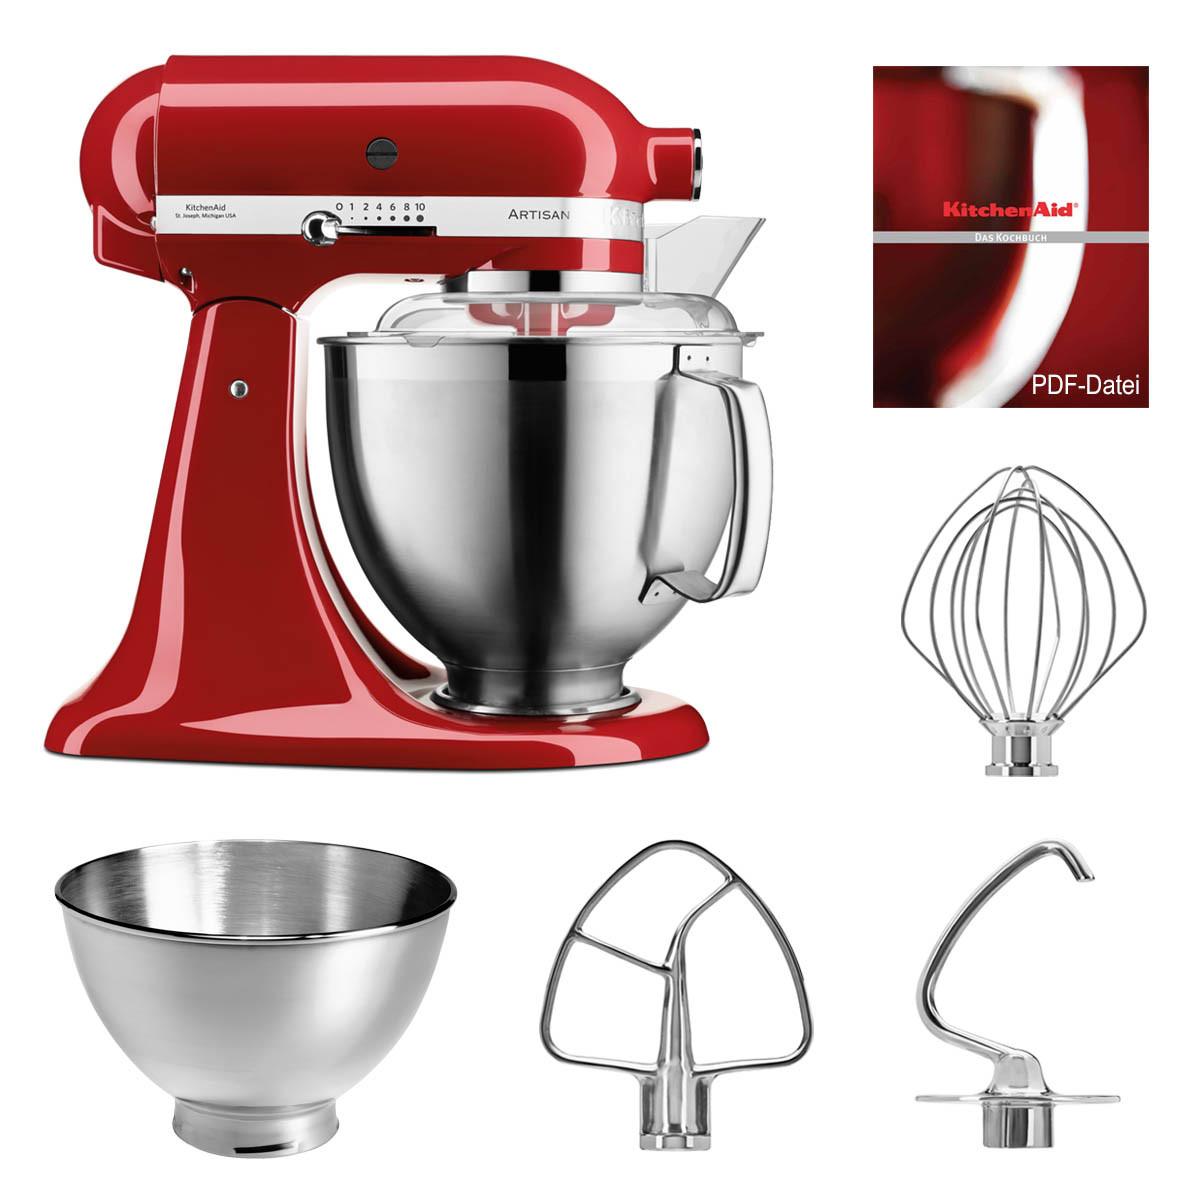 KitchenAid Küchenmaschine 5KSM185PSEER